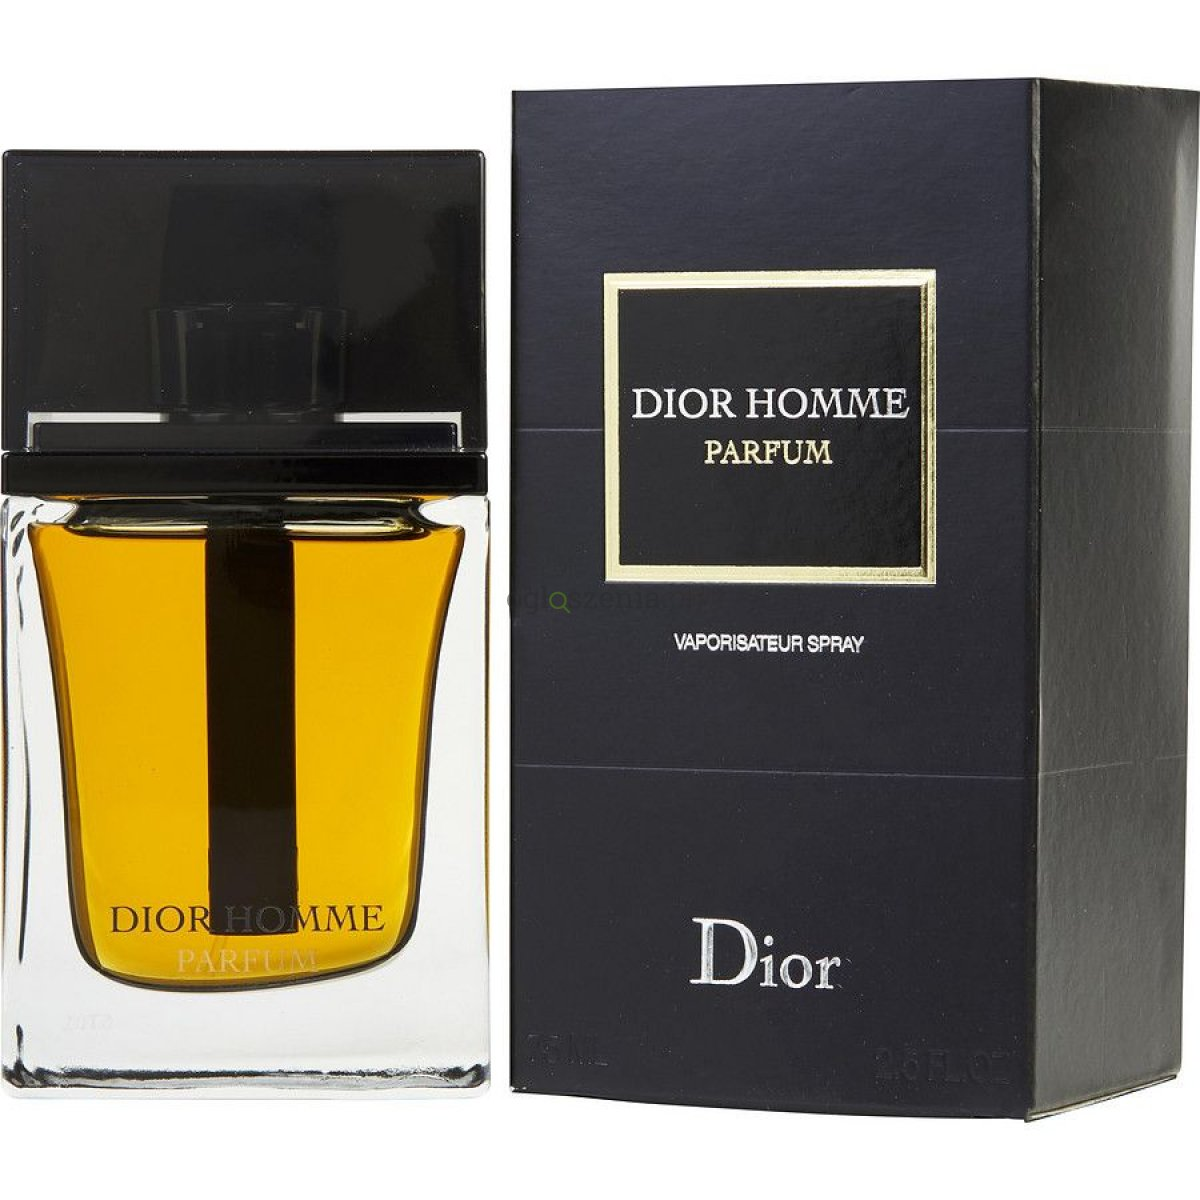 DIOR Dior Homme Parfum Woda Perfumowana